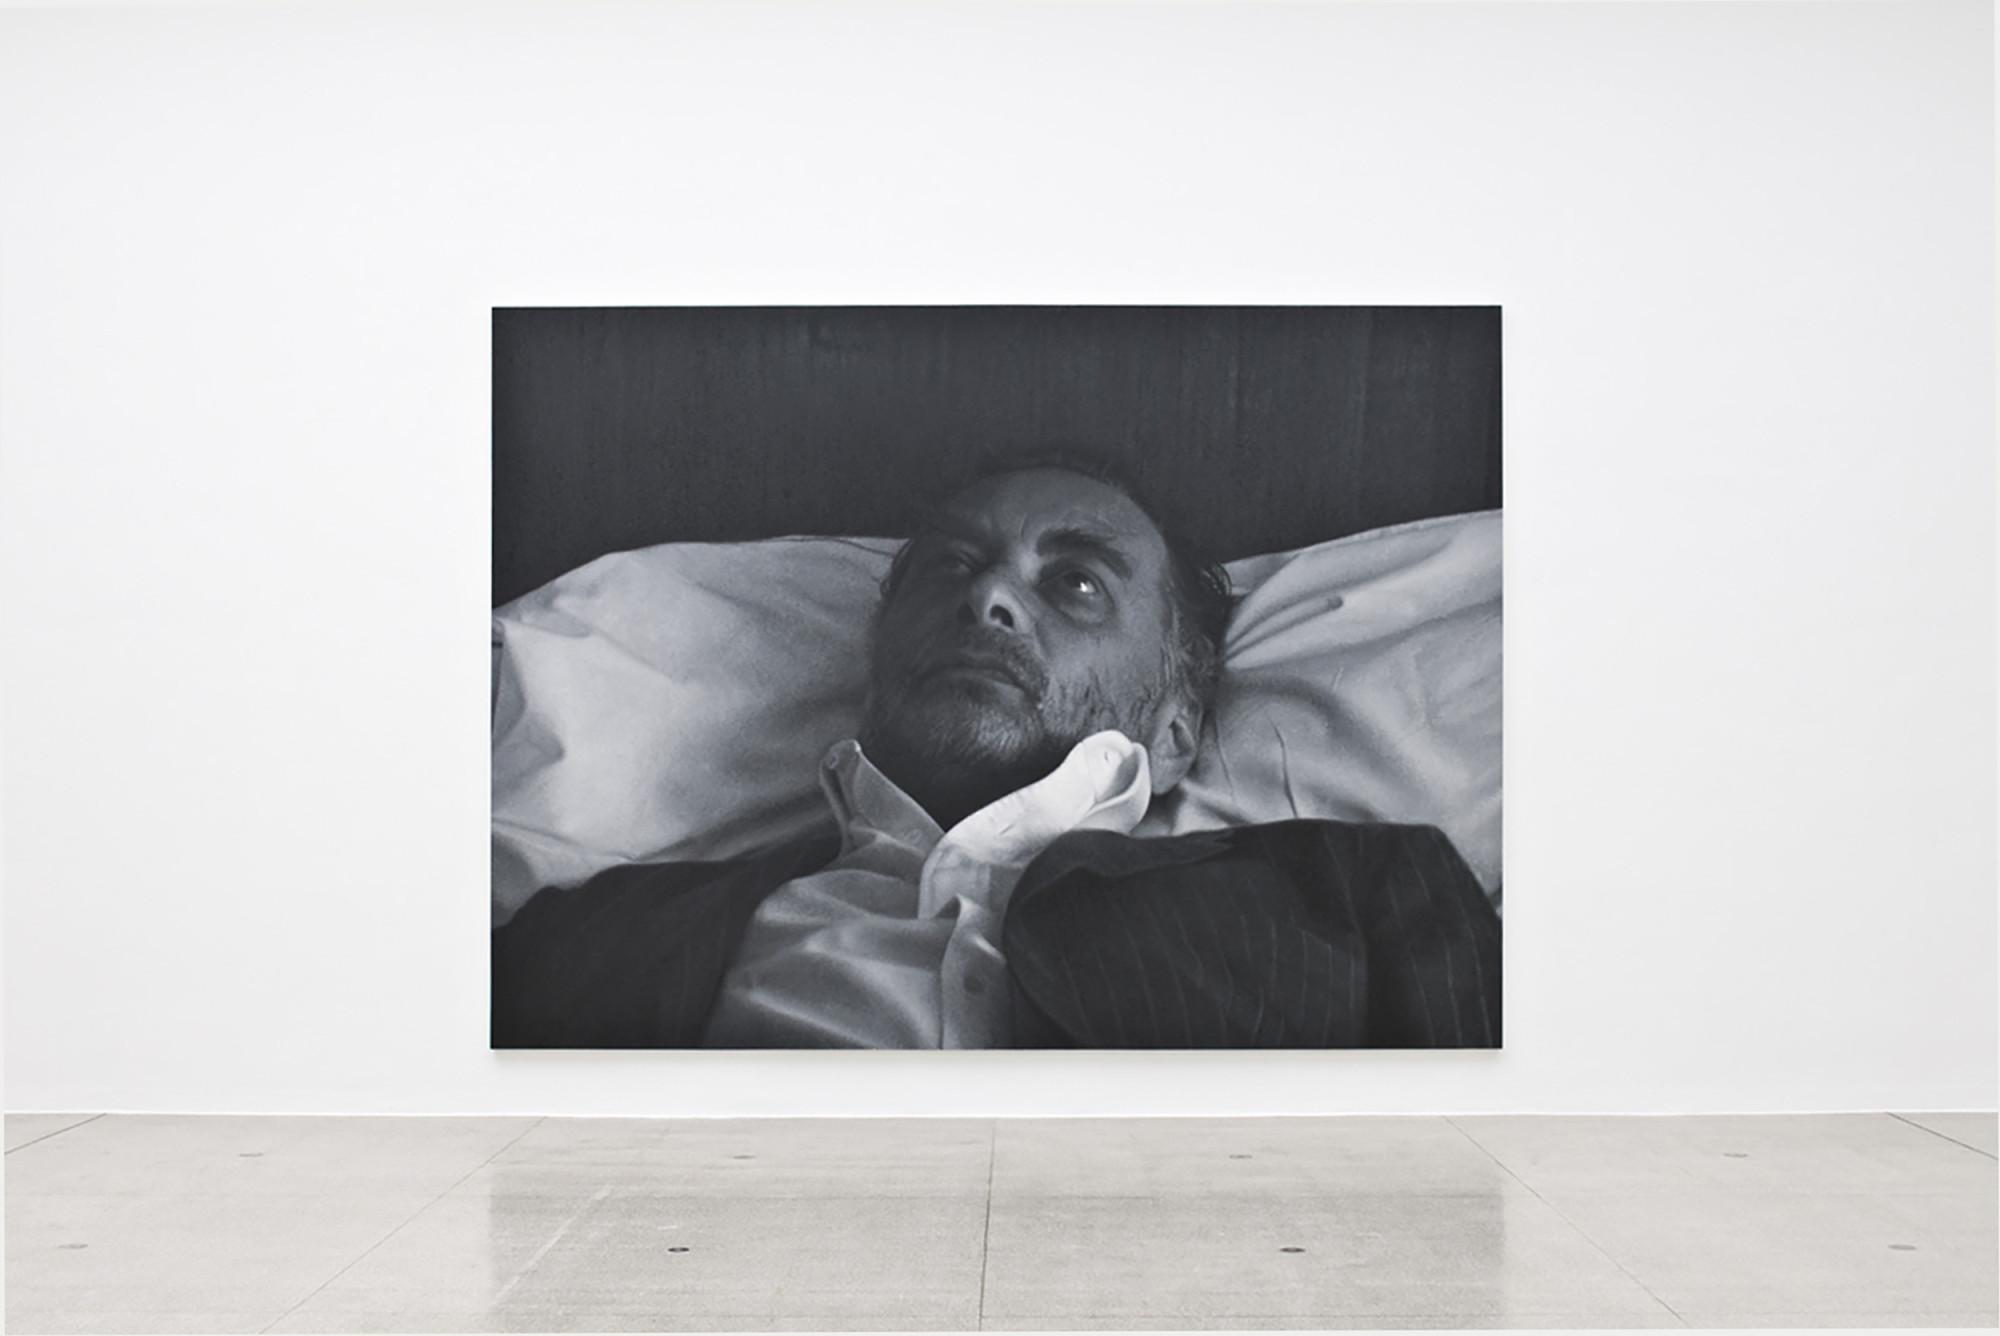 <p><em>Untitled (After Sam)</em>, Installation view, Rudolf Stingel, Secession, Vienna, 23 February – 15 April 2012</p><p>Photo: Jorit Aust</p>